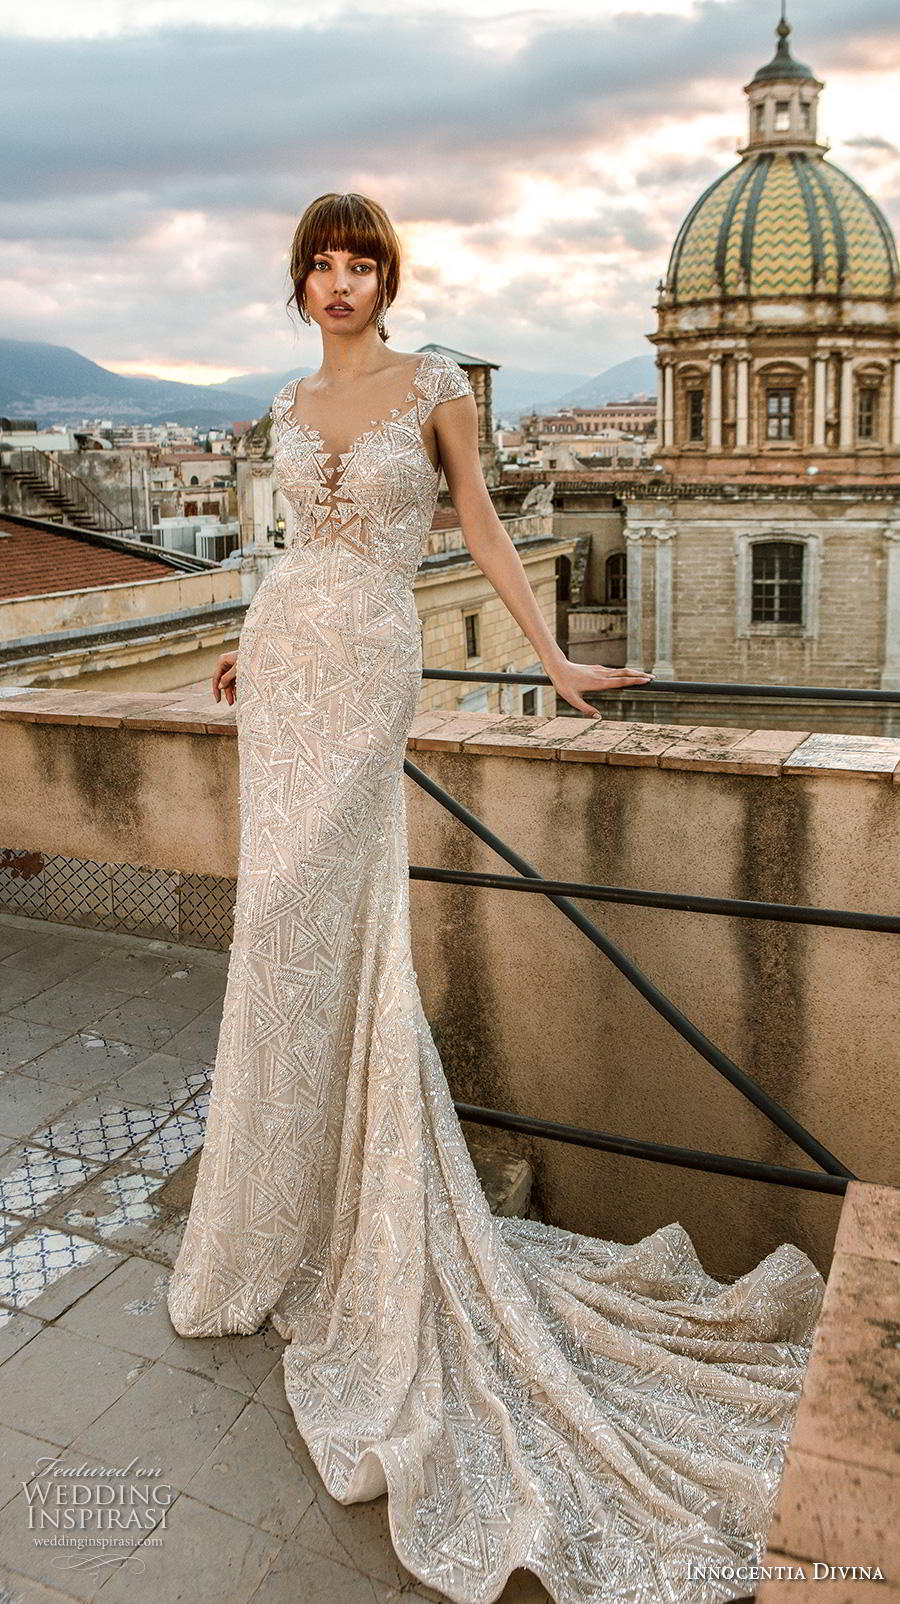 innocentia divina 2020 bridal cap sleeves diamond neck full embellishment glamorous sheath wedding dress keyhole back chapel train (3) mv